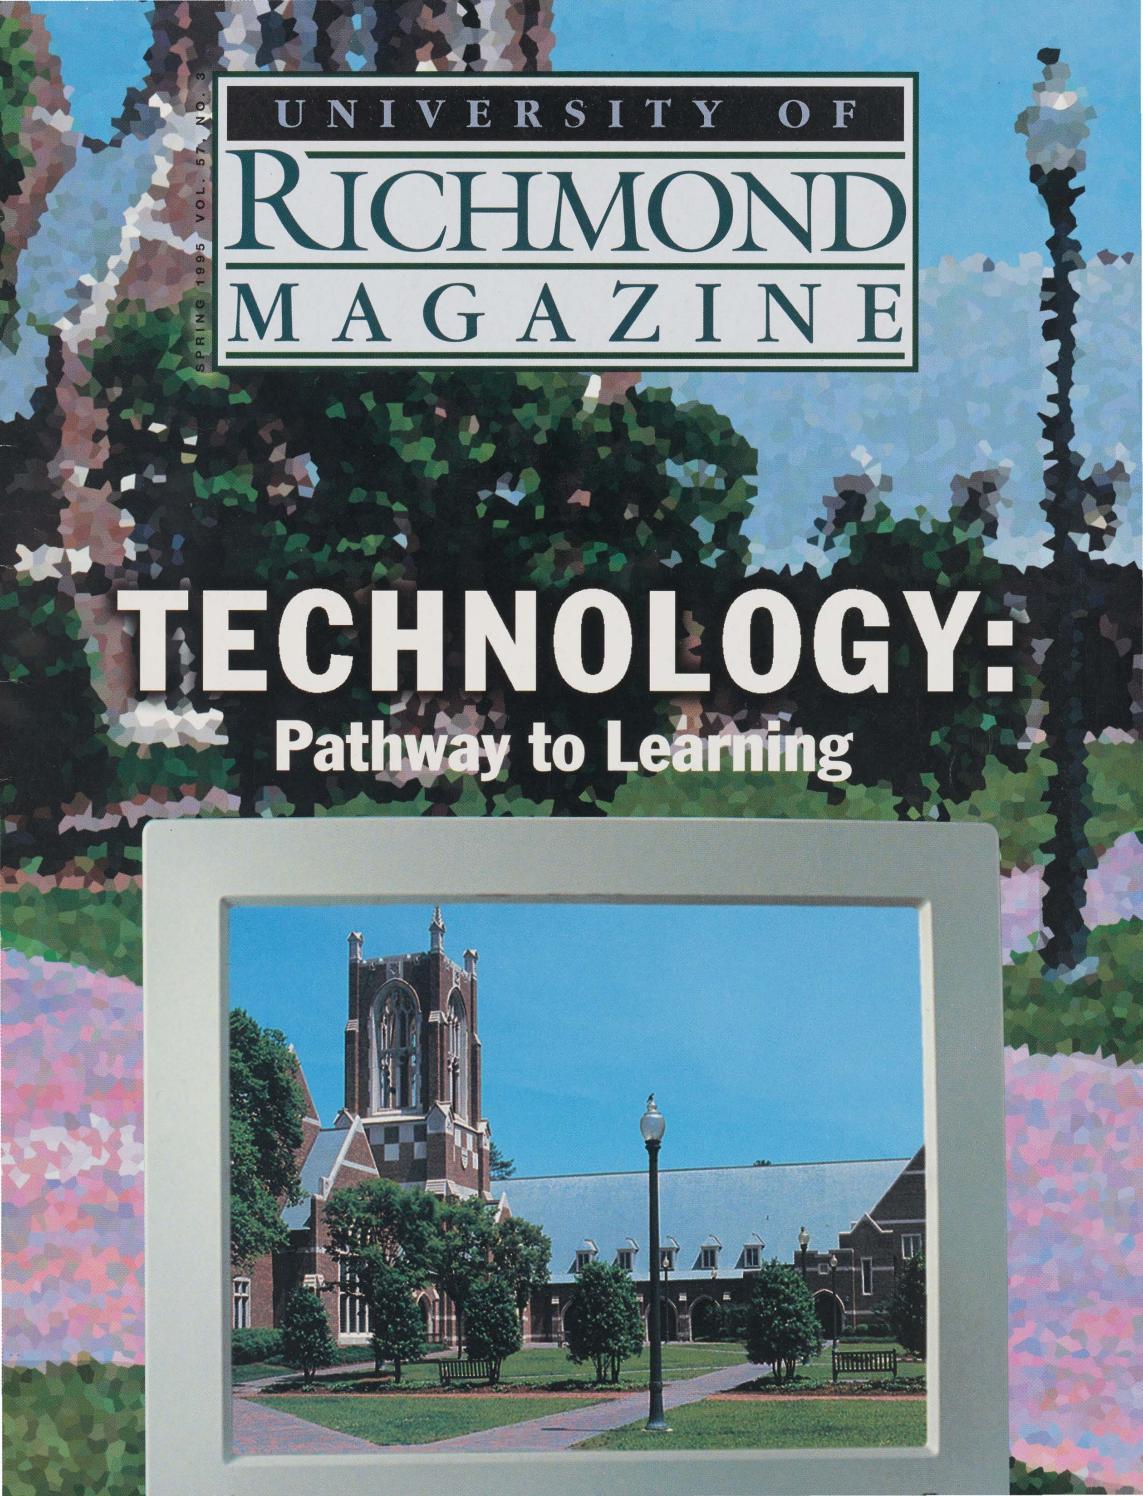 University of Richmond Magazine Spring 1995 by UR Scholarship